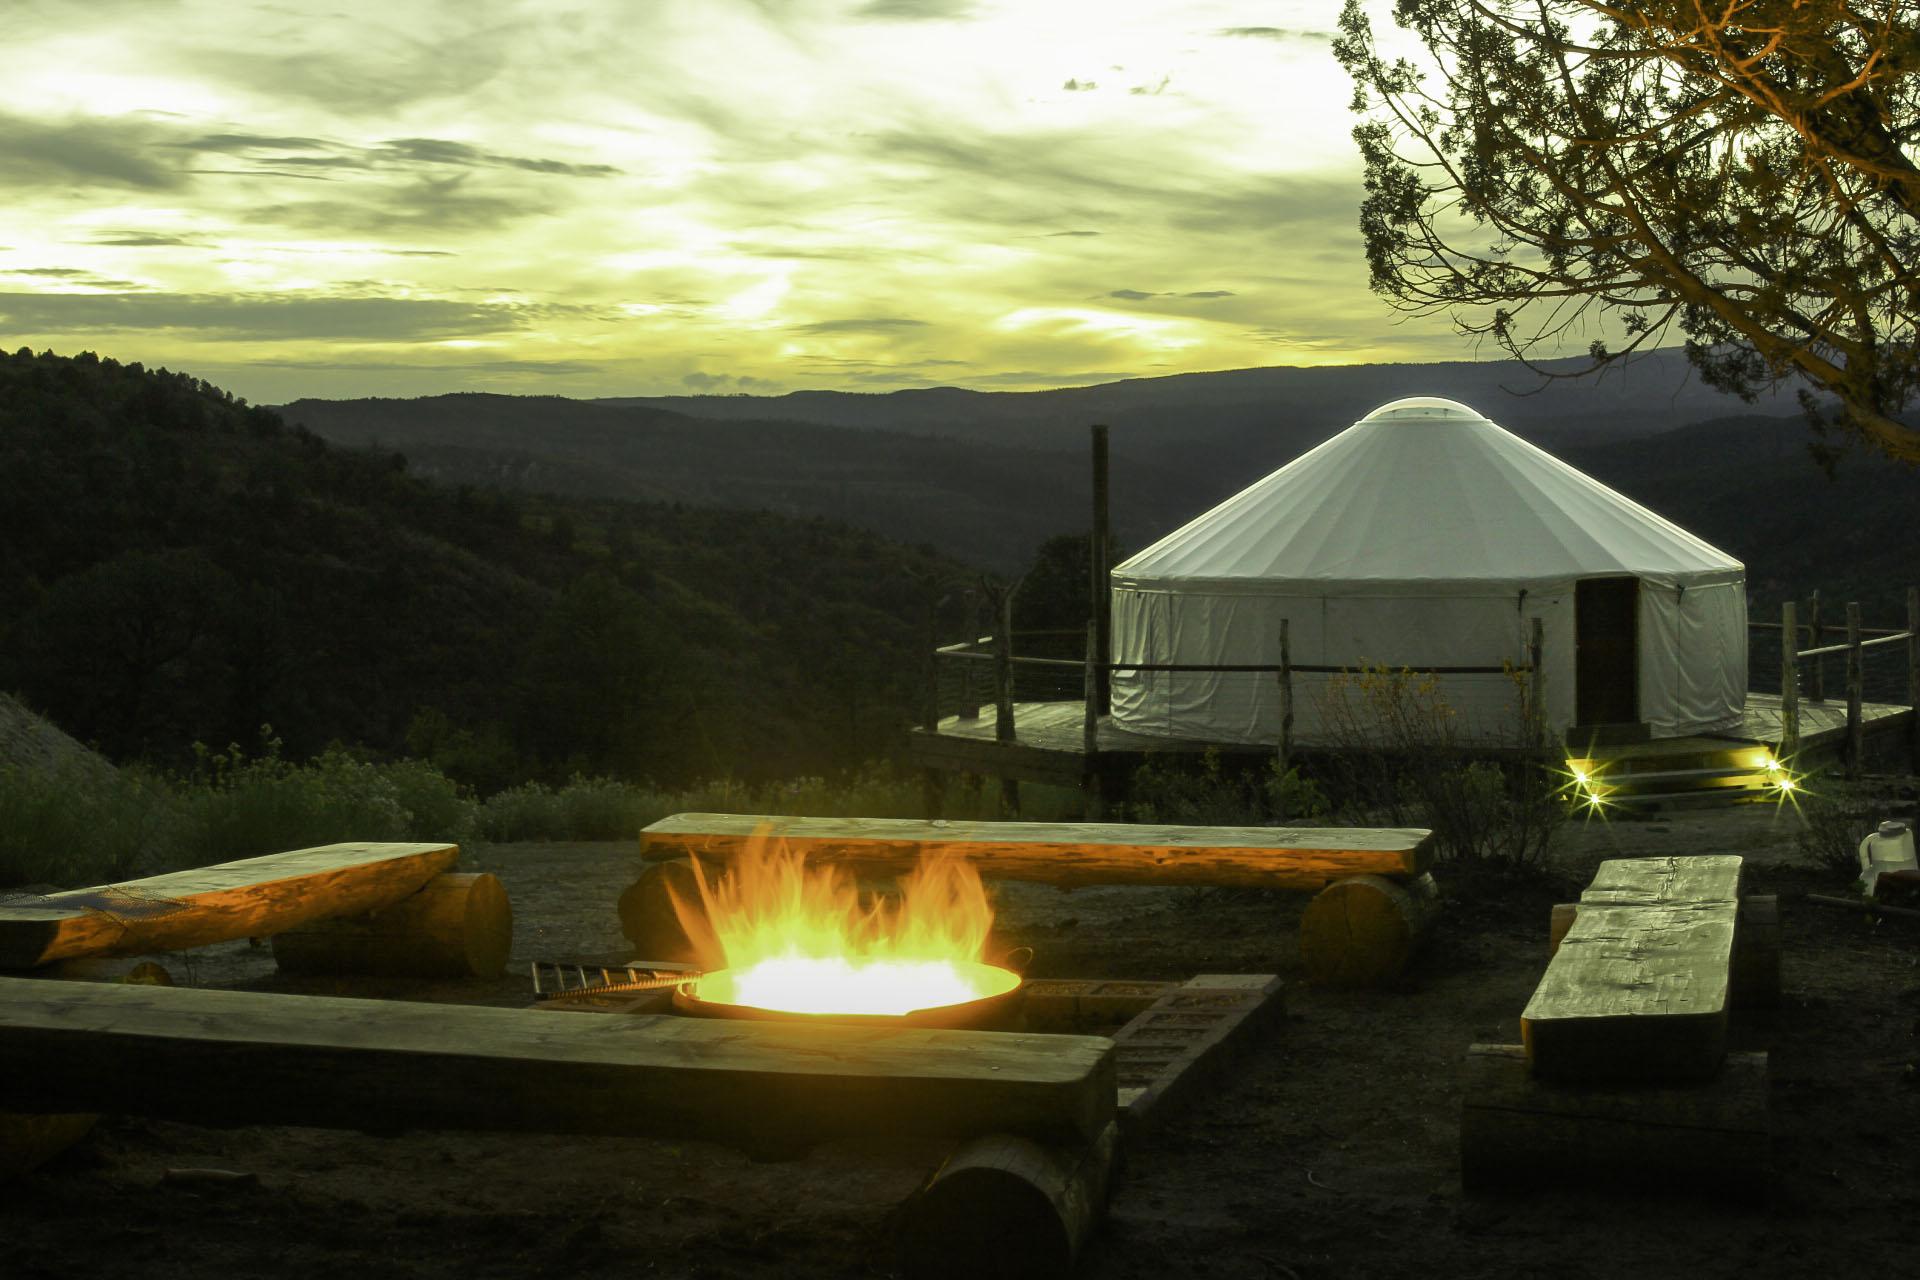 Fire Pit & Yurt